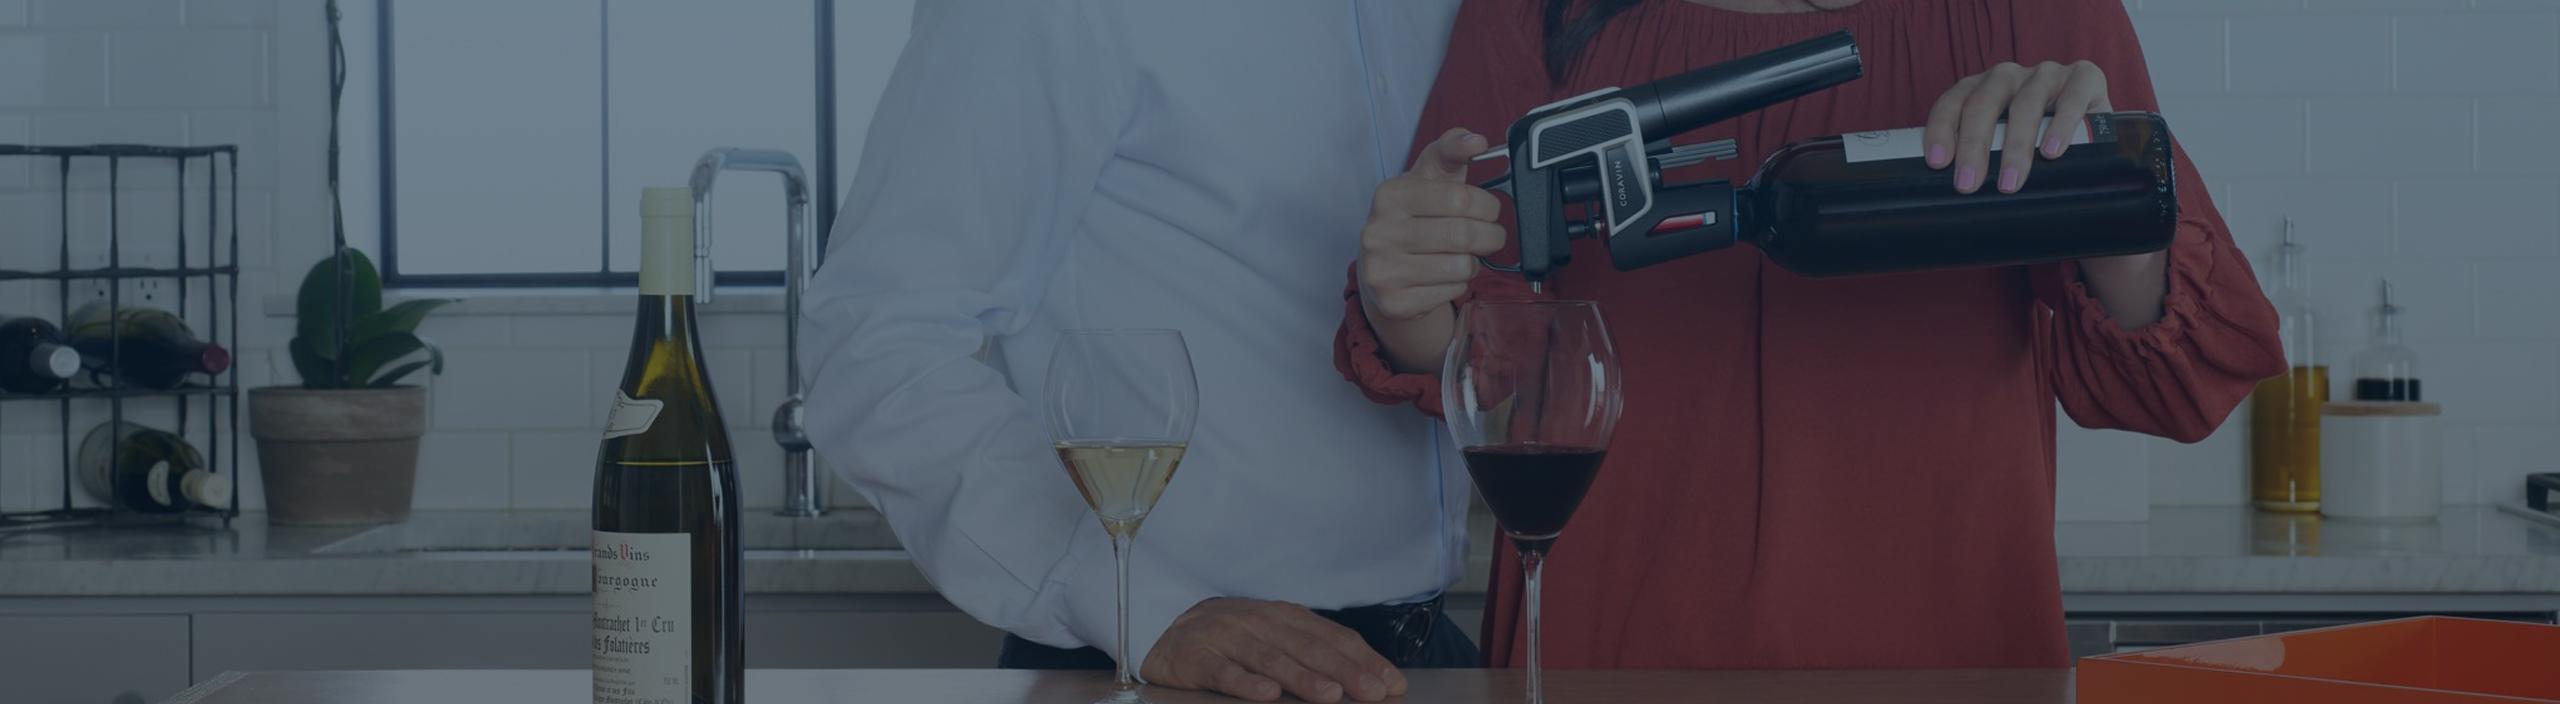 При покупке любой модели CORAVIN серии Elite, в подарок баллончик Winesave PRO